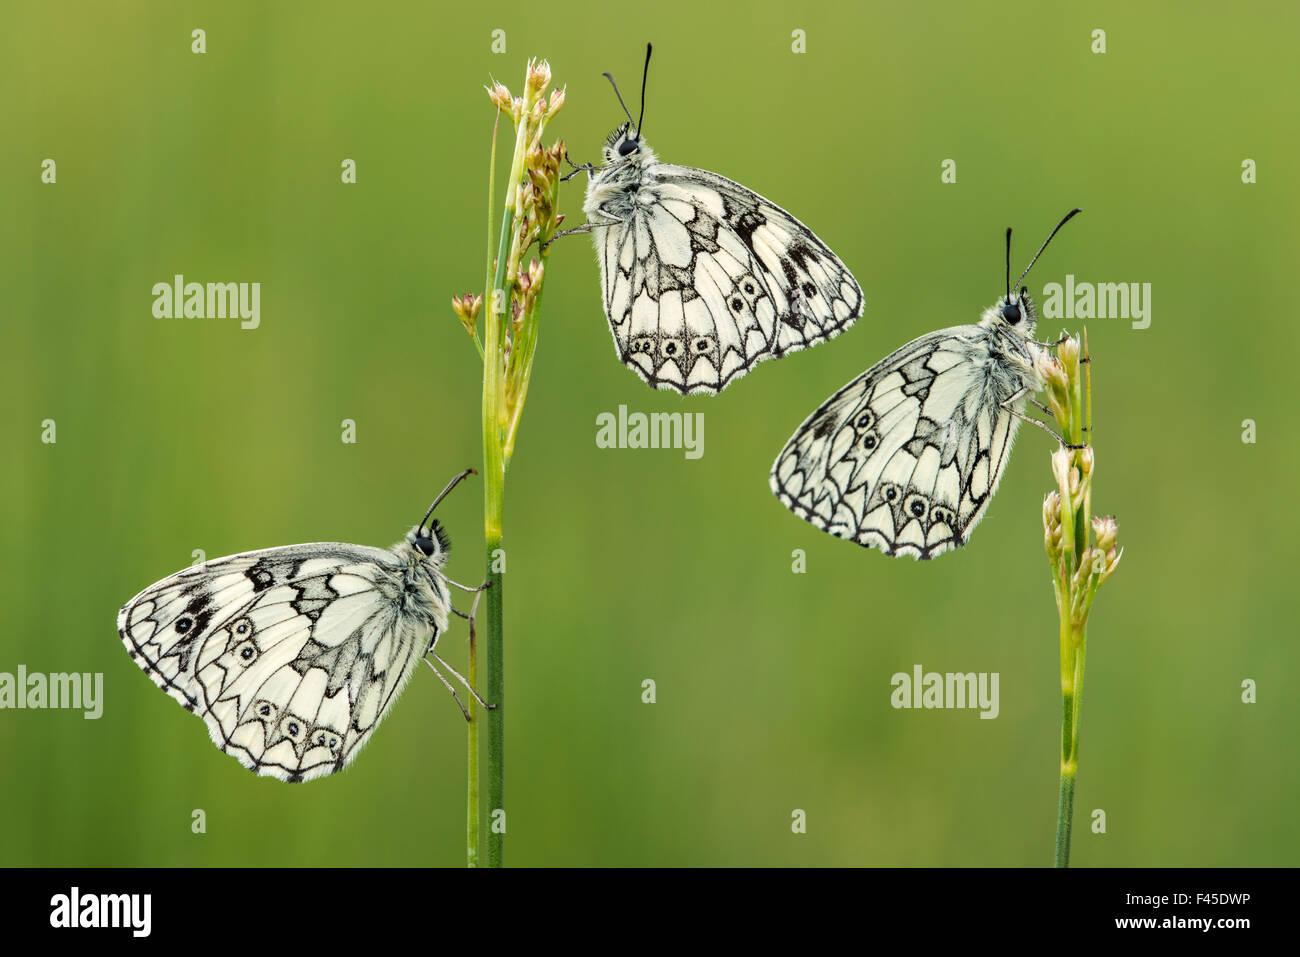 Three Marbled white butterflies (Melanargia galathea) resting on reeds, Devon, UK, July. - Stock Image